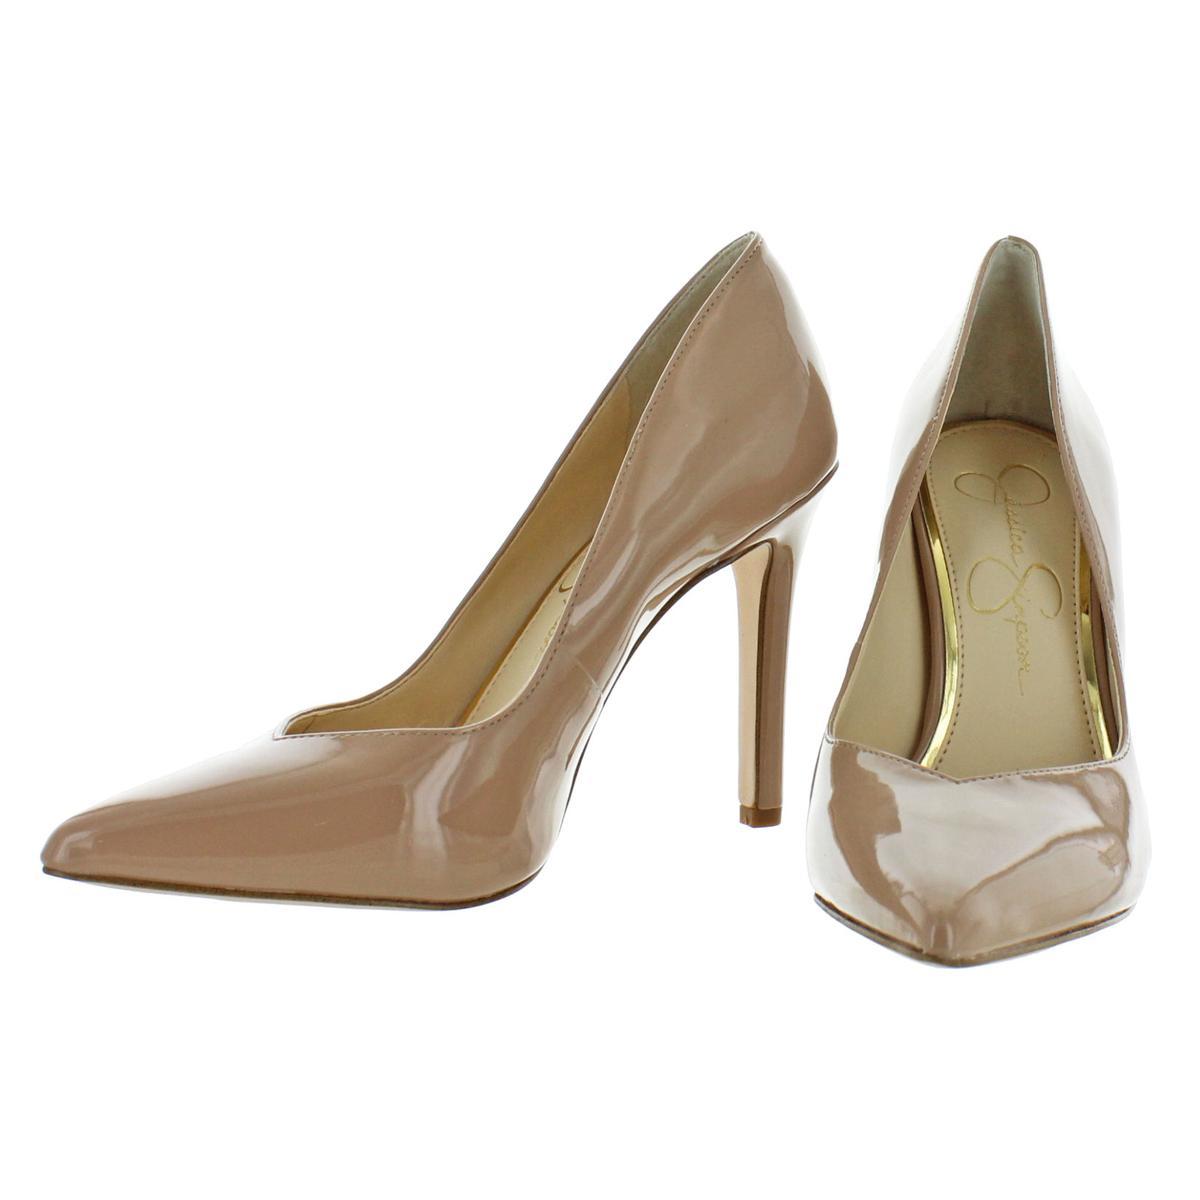 Jessica-Simpson-Women-039-s-Cylvie-Metallic-V-Cut-Classic-Pumps-Heels-Shoes thumbnail 7